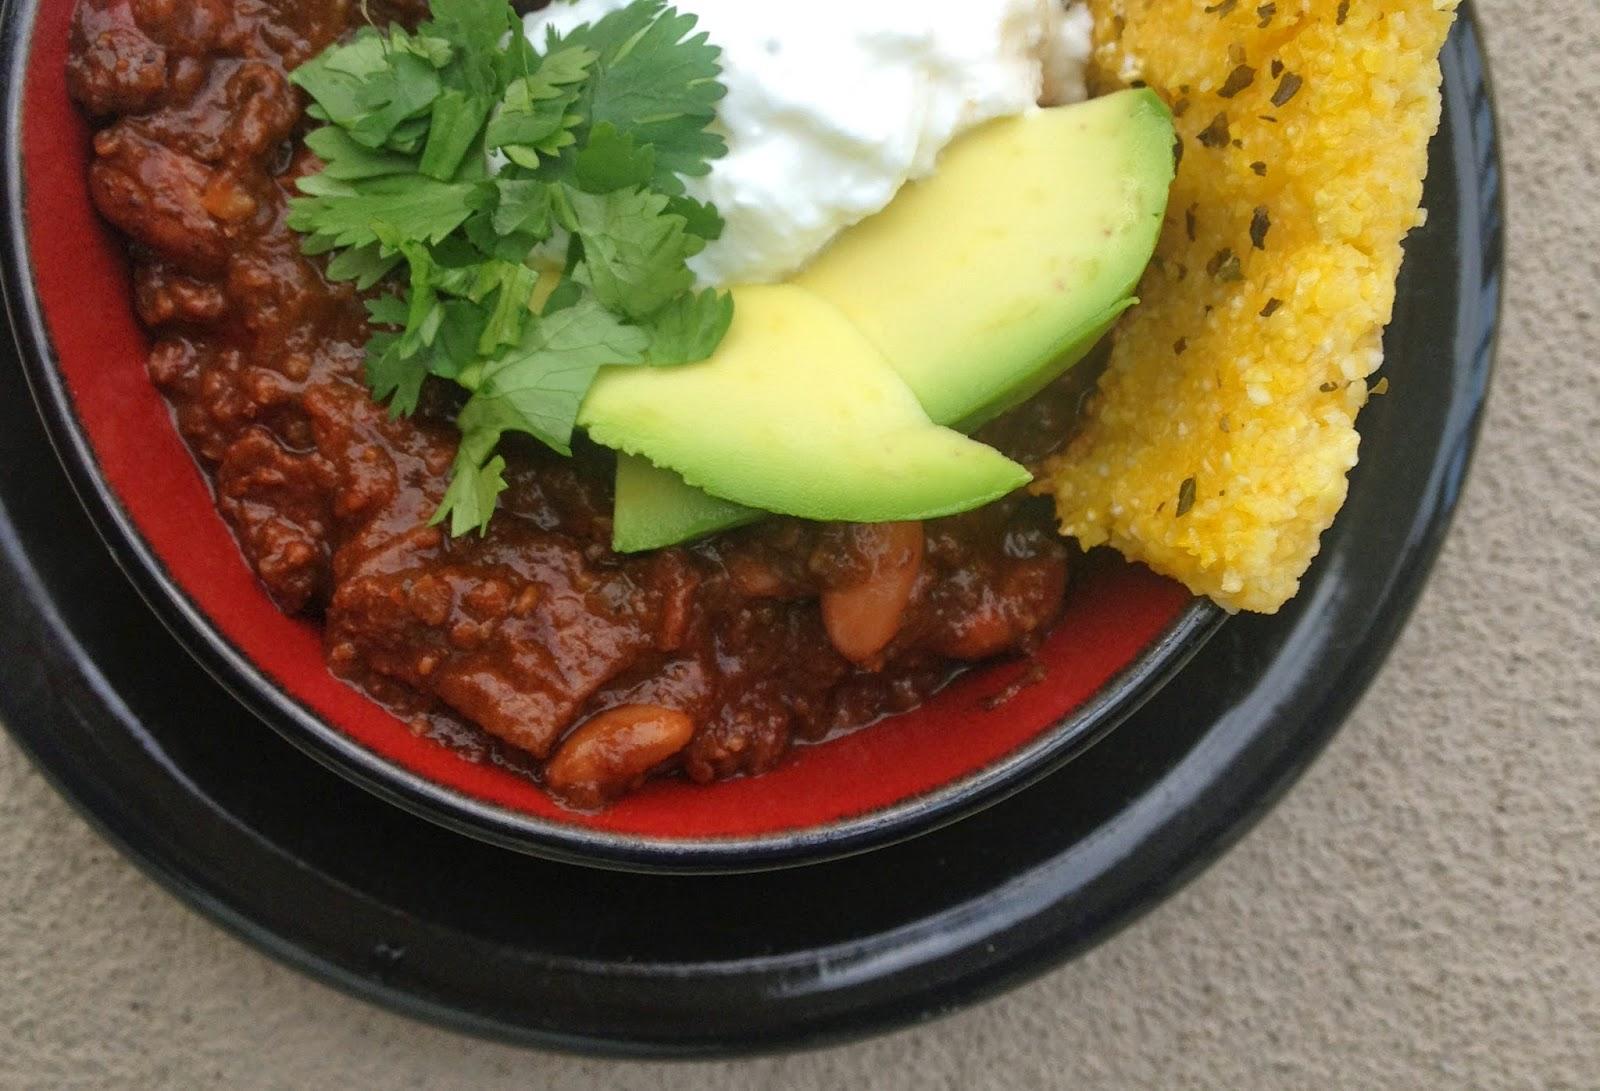 Savouring Stella: The Best Chili Of Your Life: Chili Negro